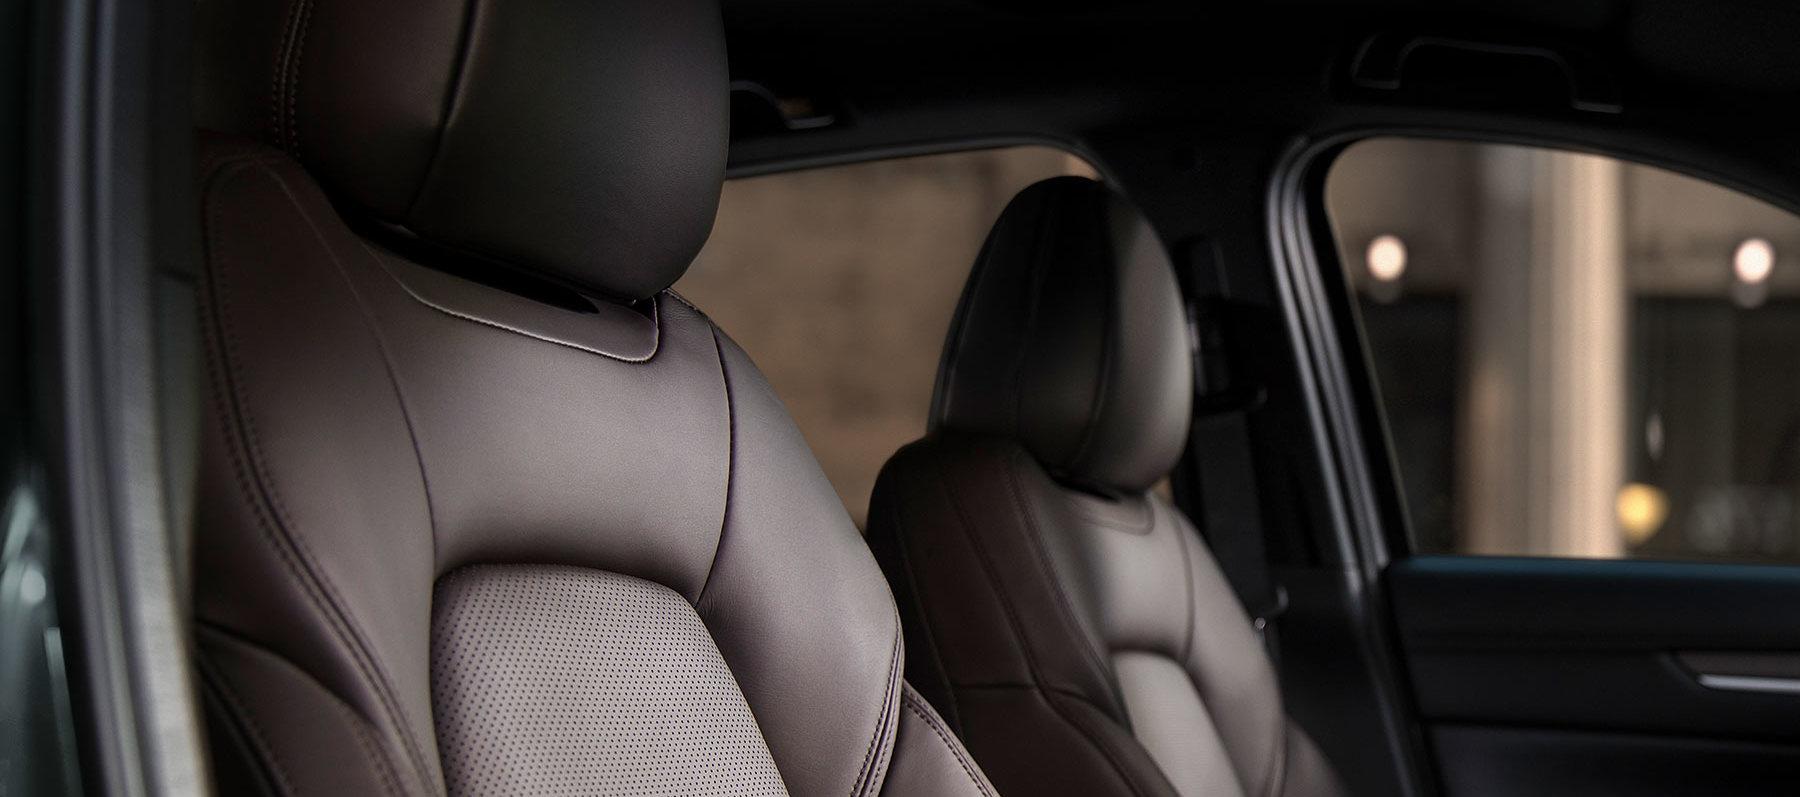 Plush Seating in the 2019 Mazda CX-5!